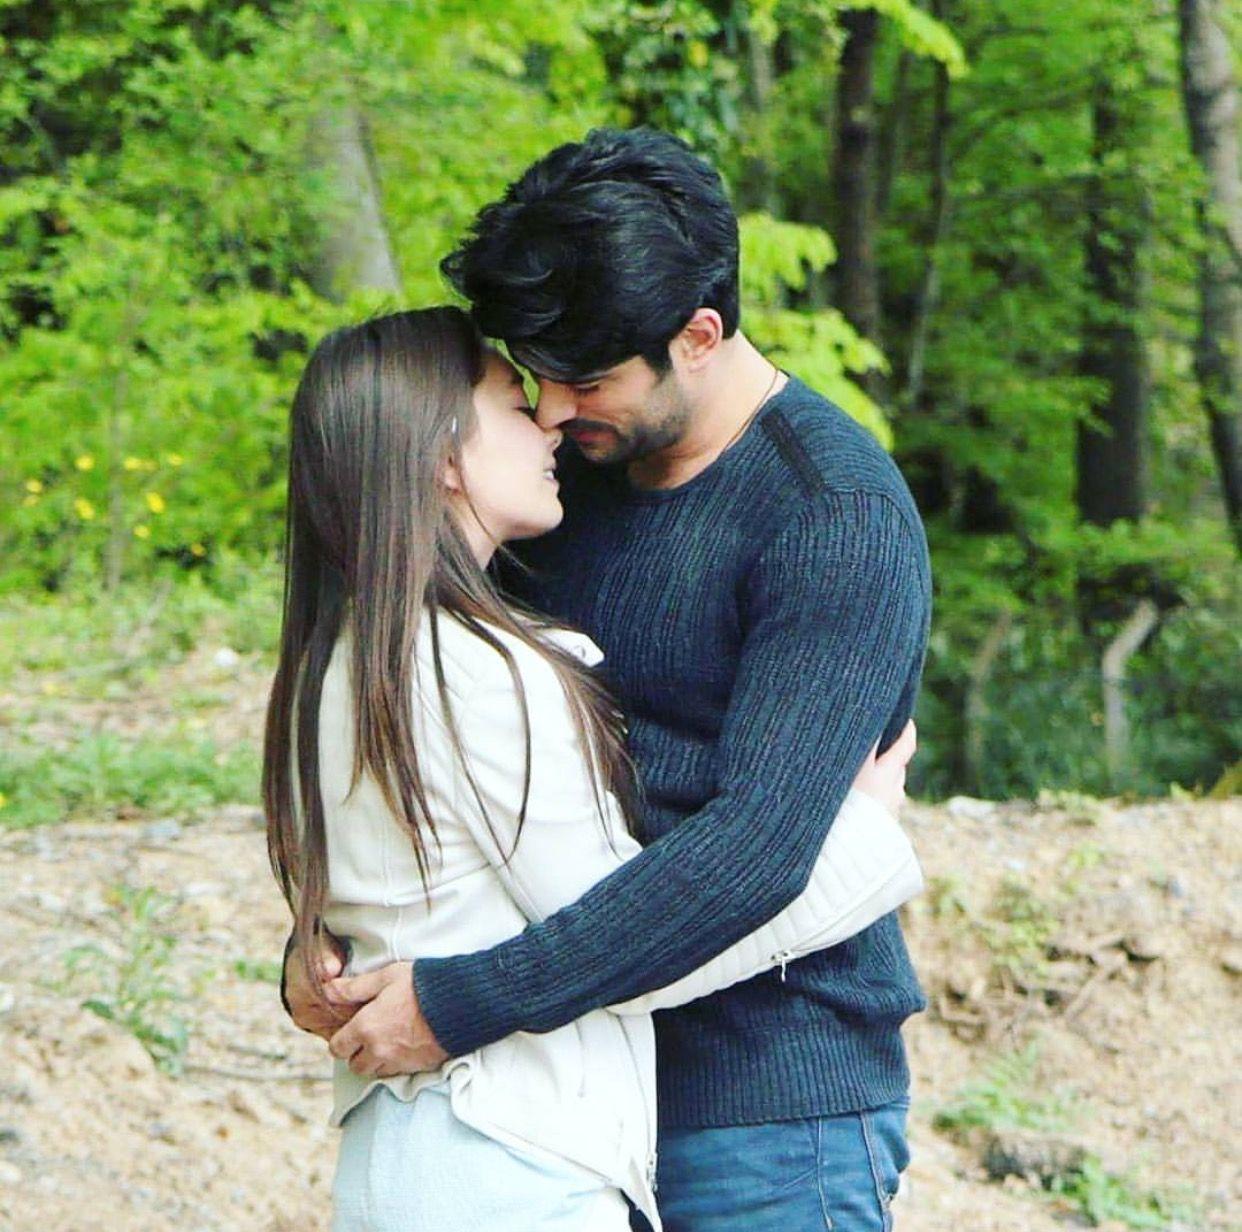 Pin By Emilia On Kara Sevda Romantic Couples Endless Love Full Movie Couple Photography Poses